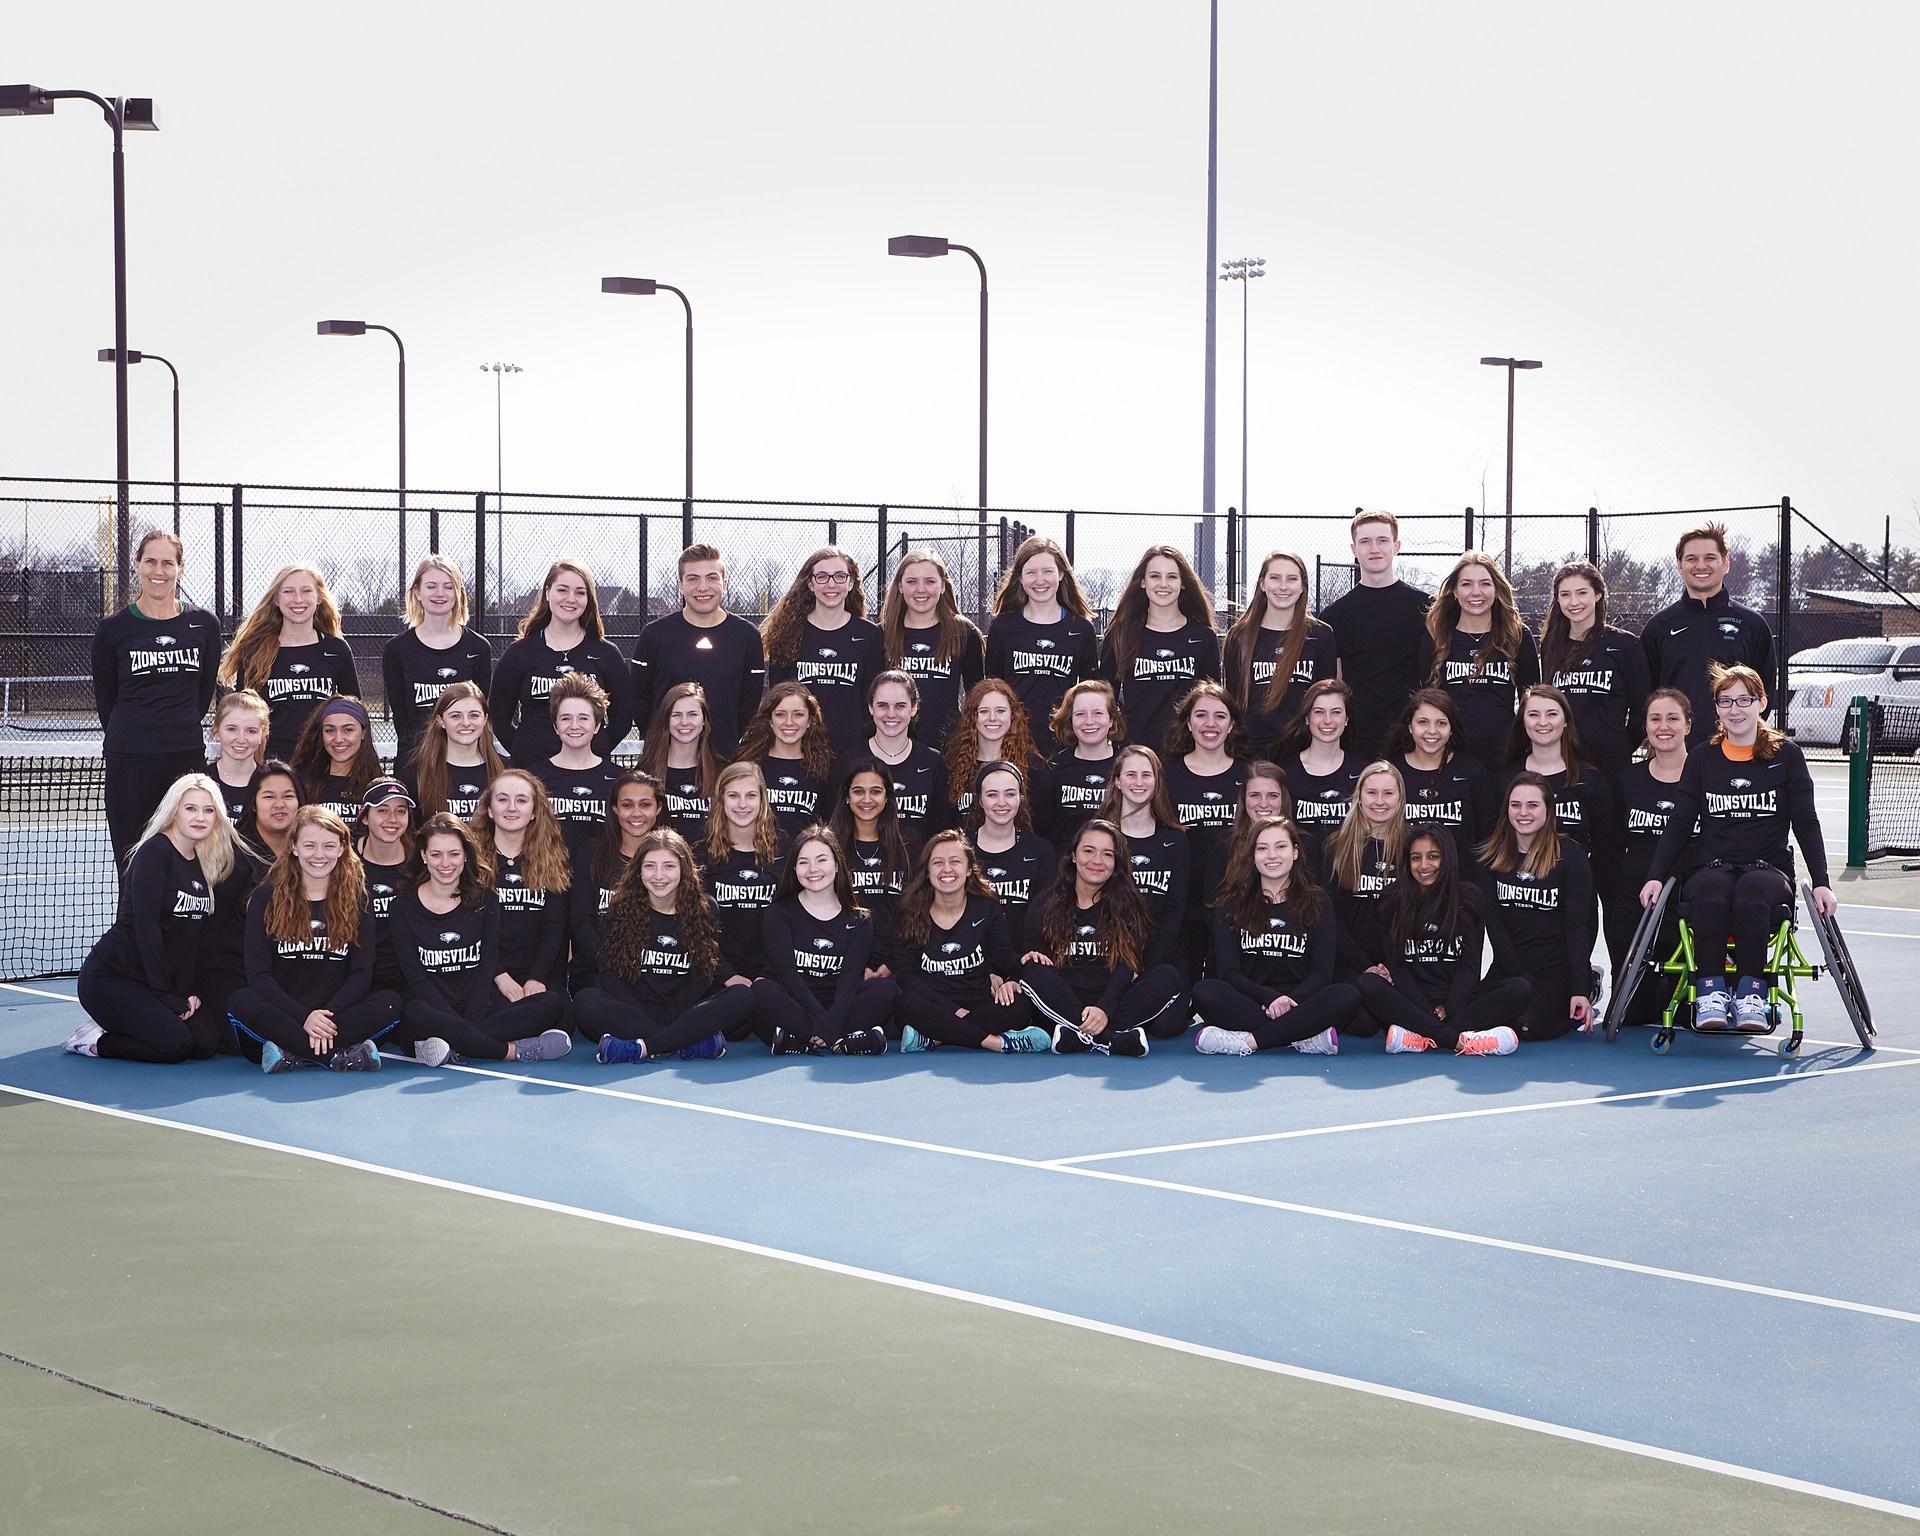 2018 Girls Tennis team photo